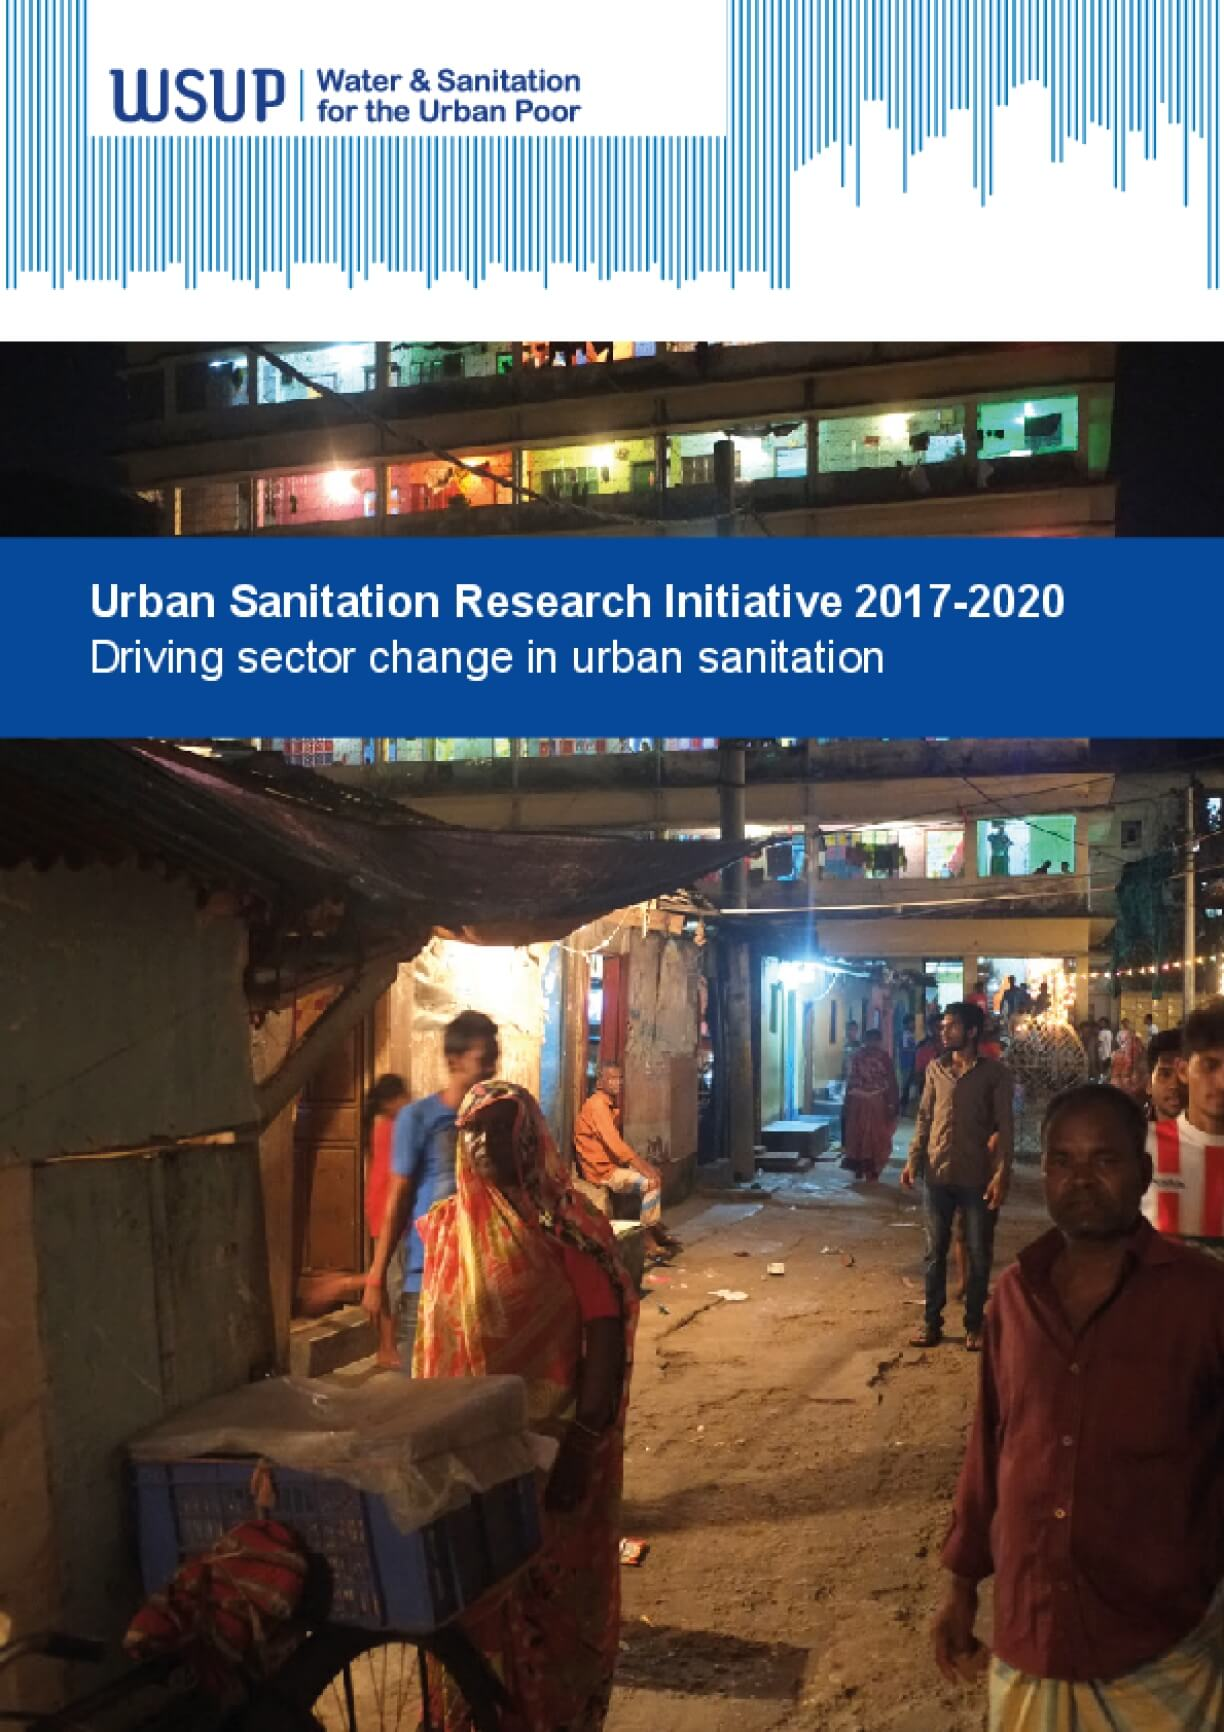 Urban Sanitation Research Initiative 2017-2020: Driving Sector Change in Urban Sanitation